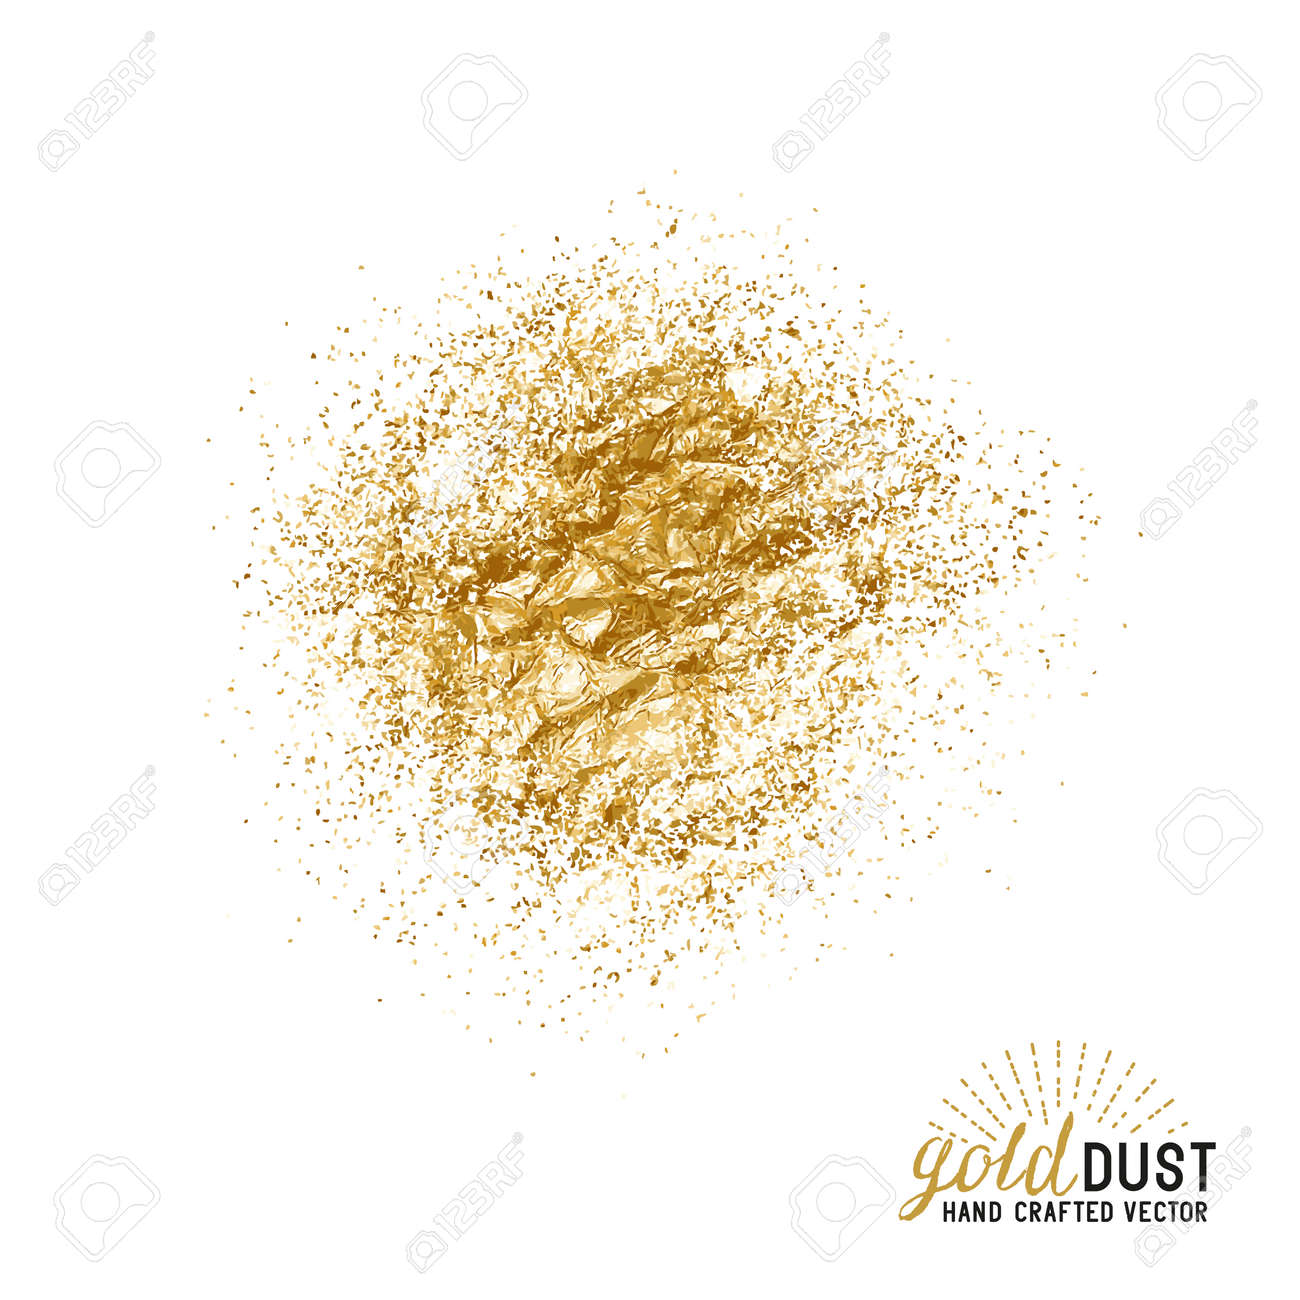 Vector Gold Dust. Foil gold dust particles. Vector illustration. - 55683631